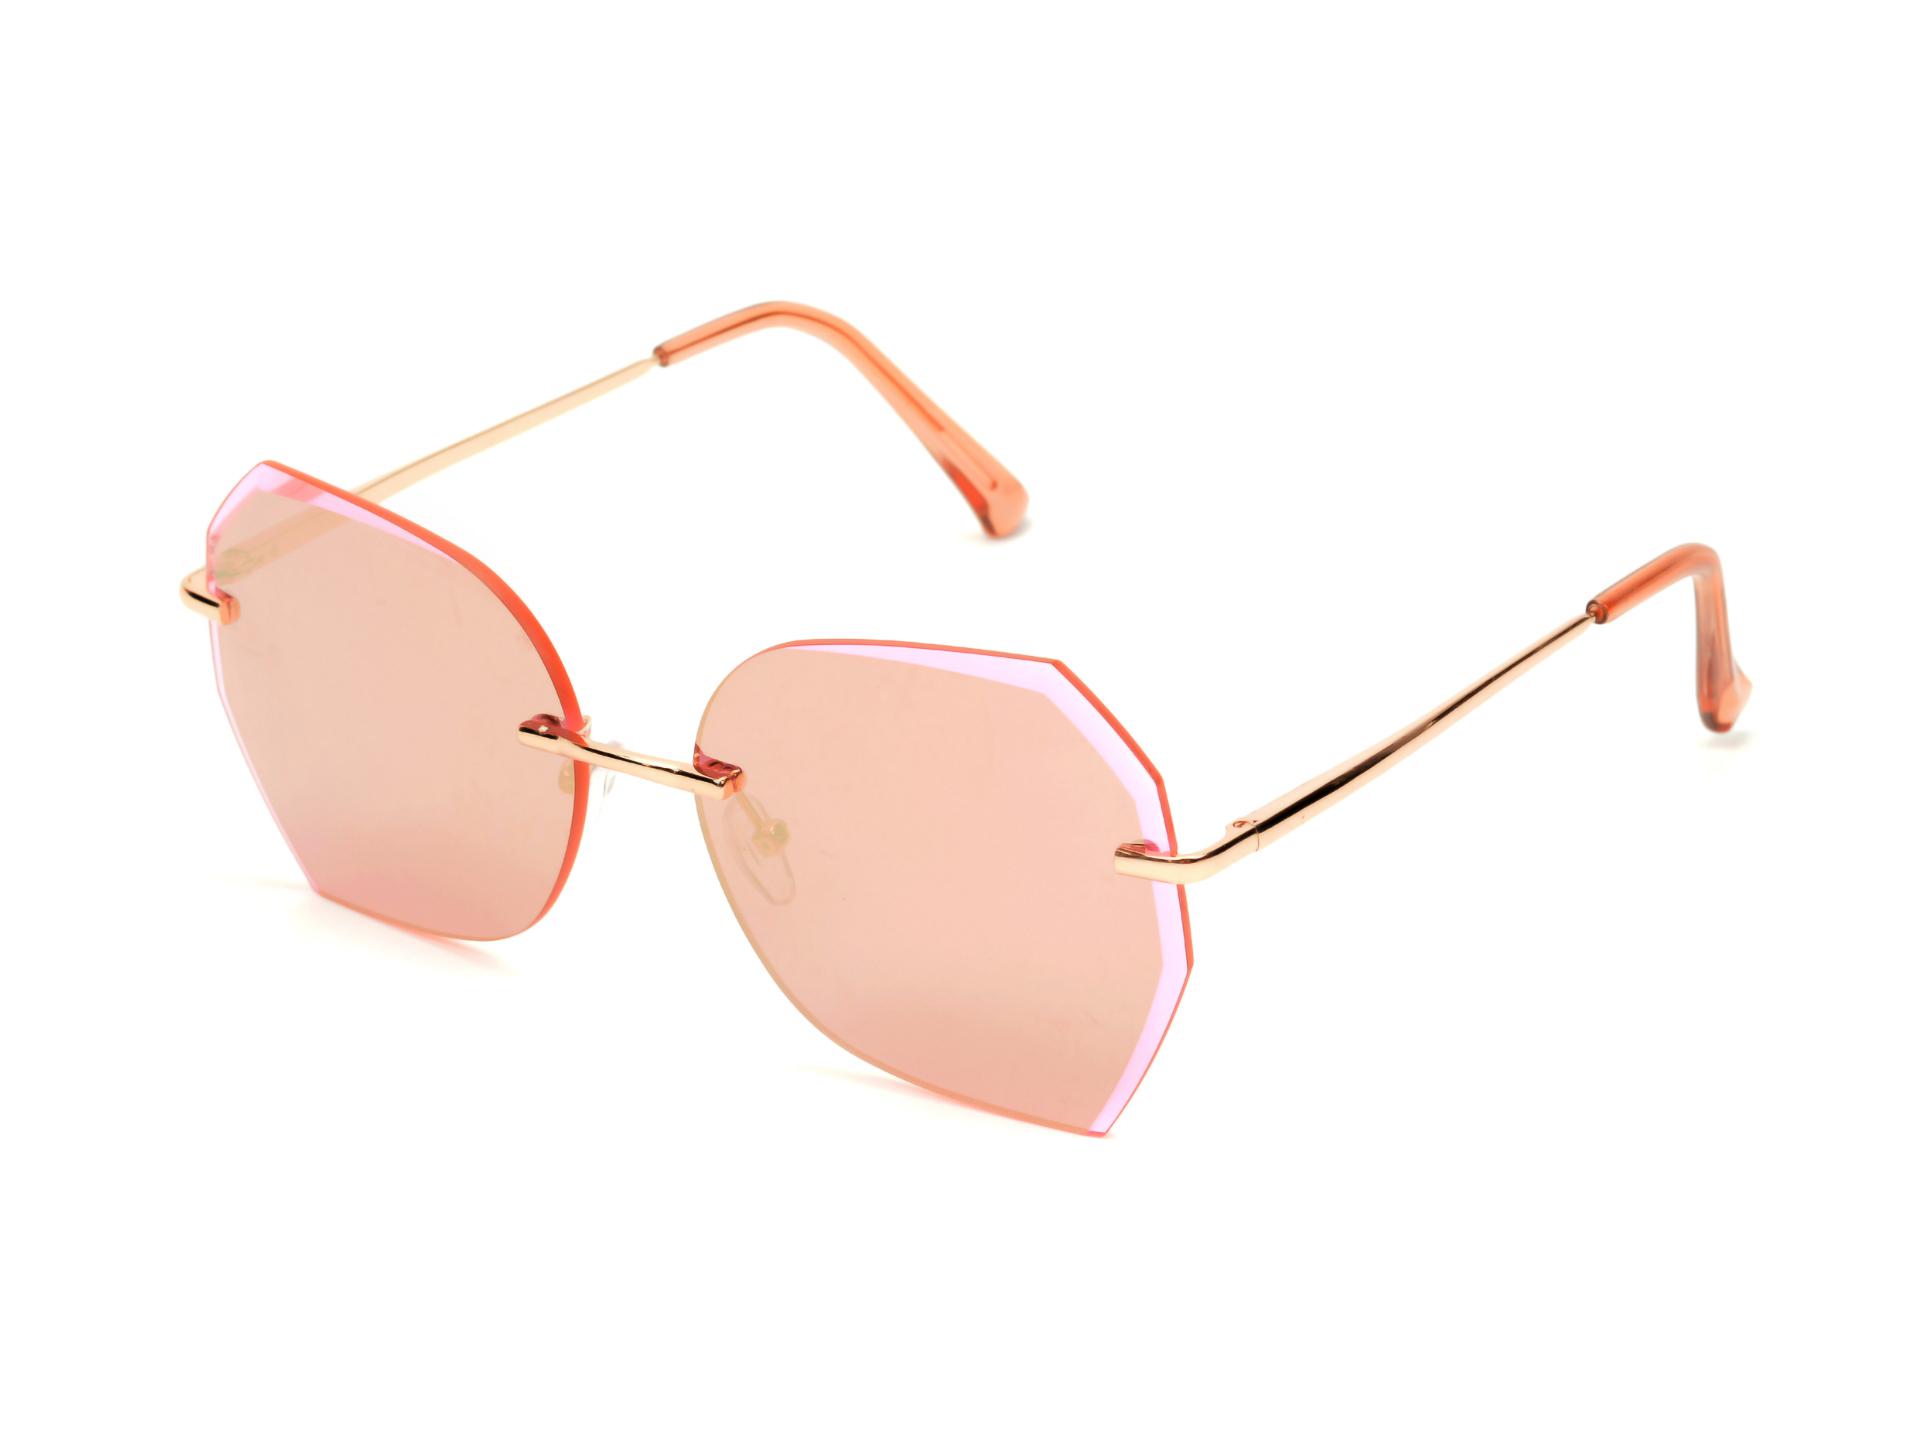 Ochelari de soare ALDO roz, Songbird653, din PVC imagine